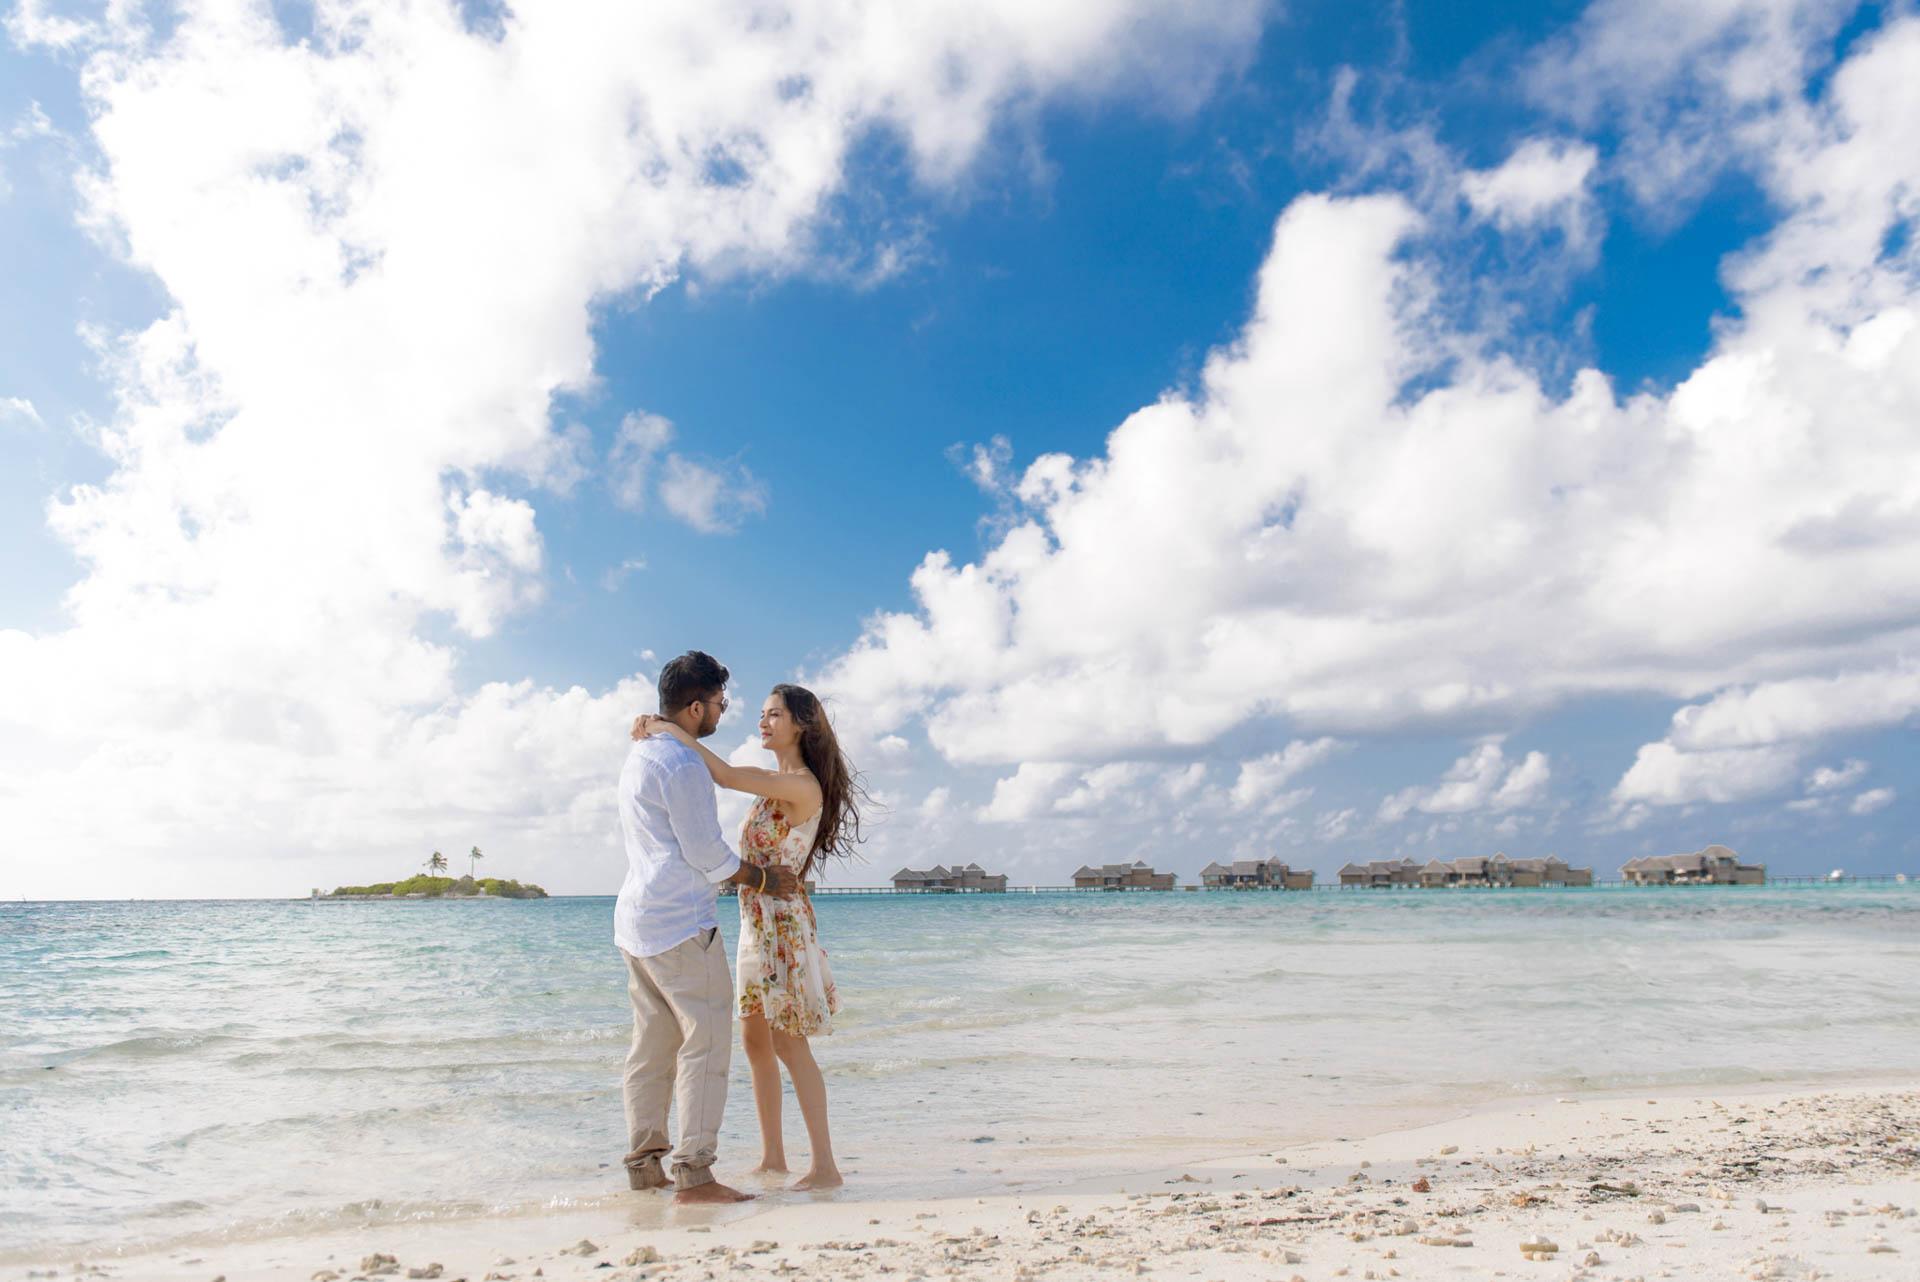 Abhijit Meghna Romantic Vacation in Maldives 15